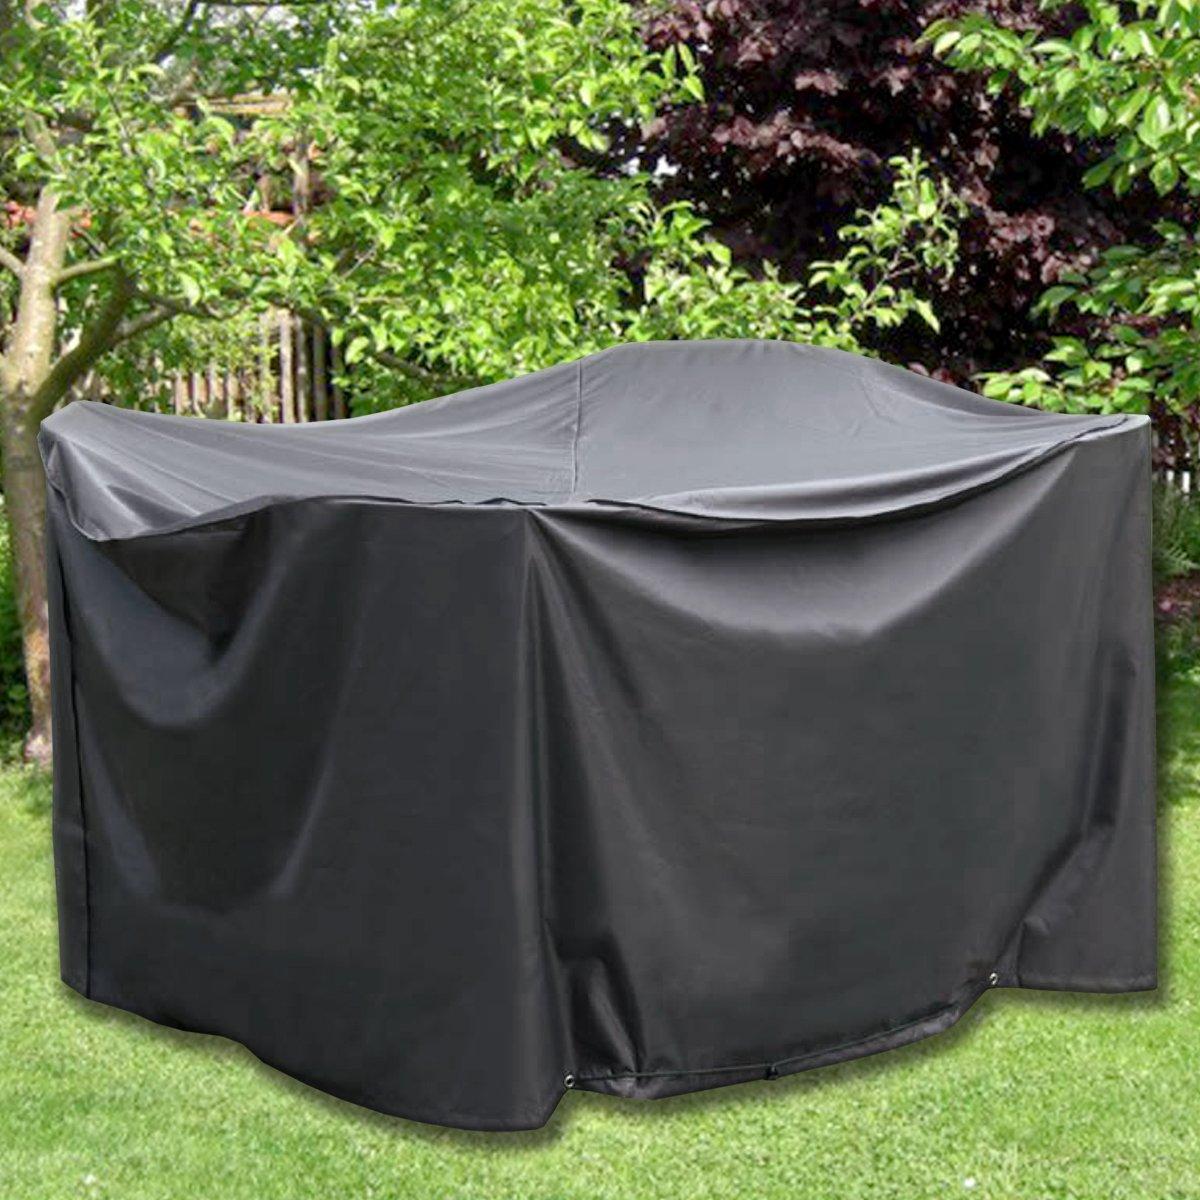 Verschiedene Gartenmöbel Schutzhüllen aus Oxford Polyester 420D ...